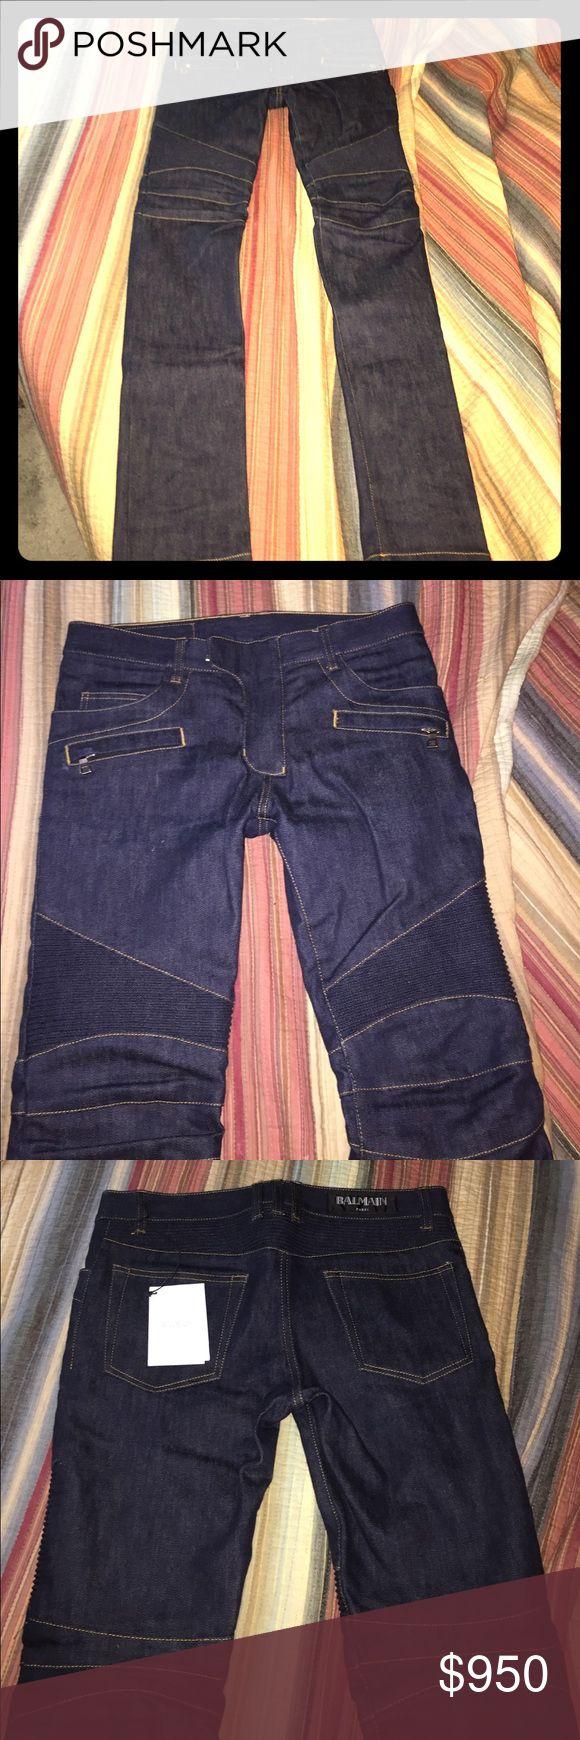 Balmain biker jeans men balmain biker jeans. Brand new size 30 waste Balmain Jeans